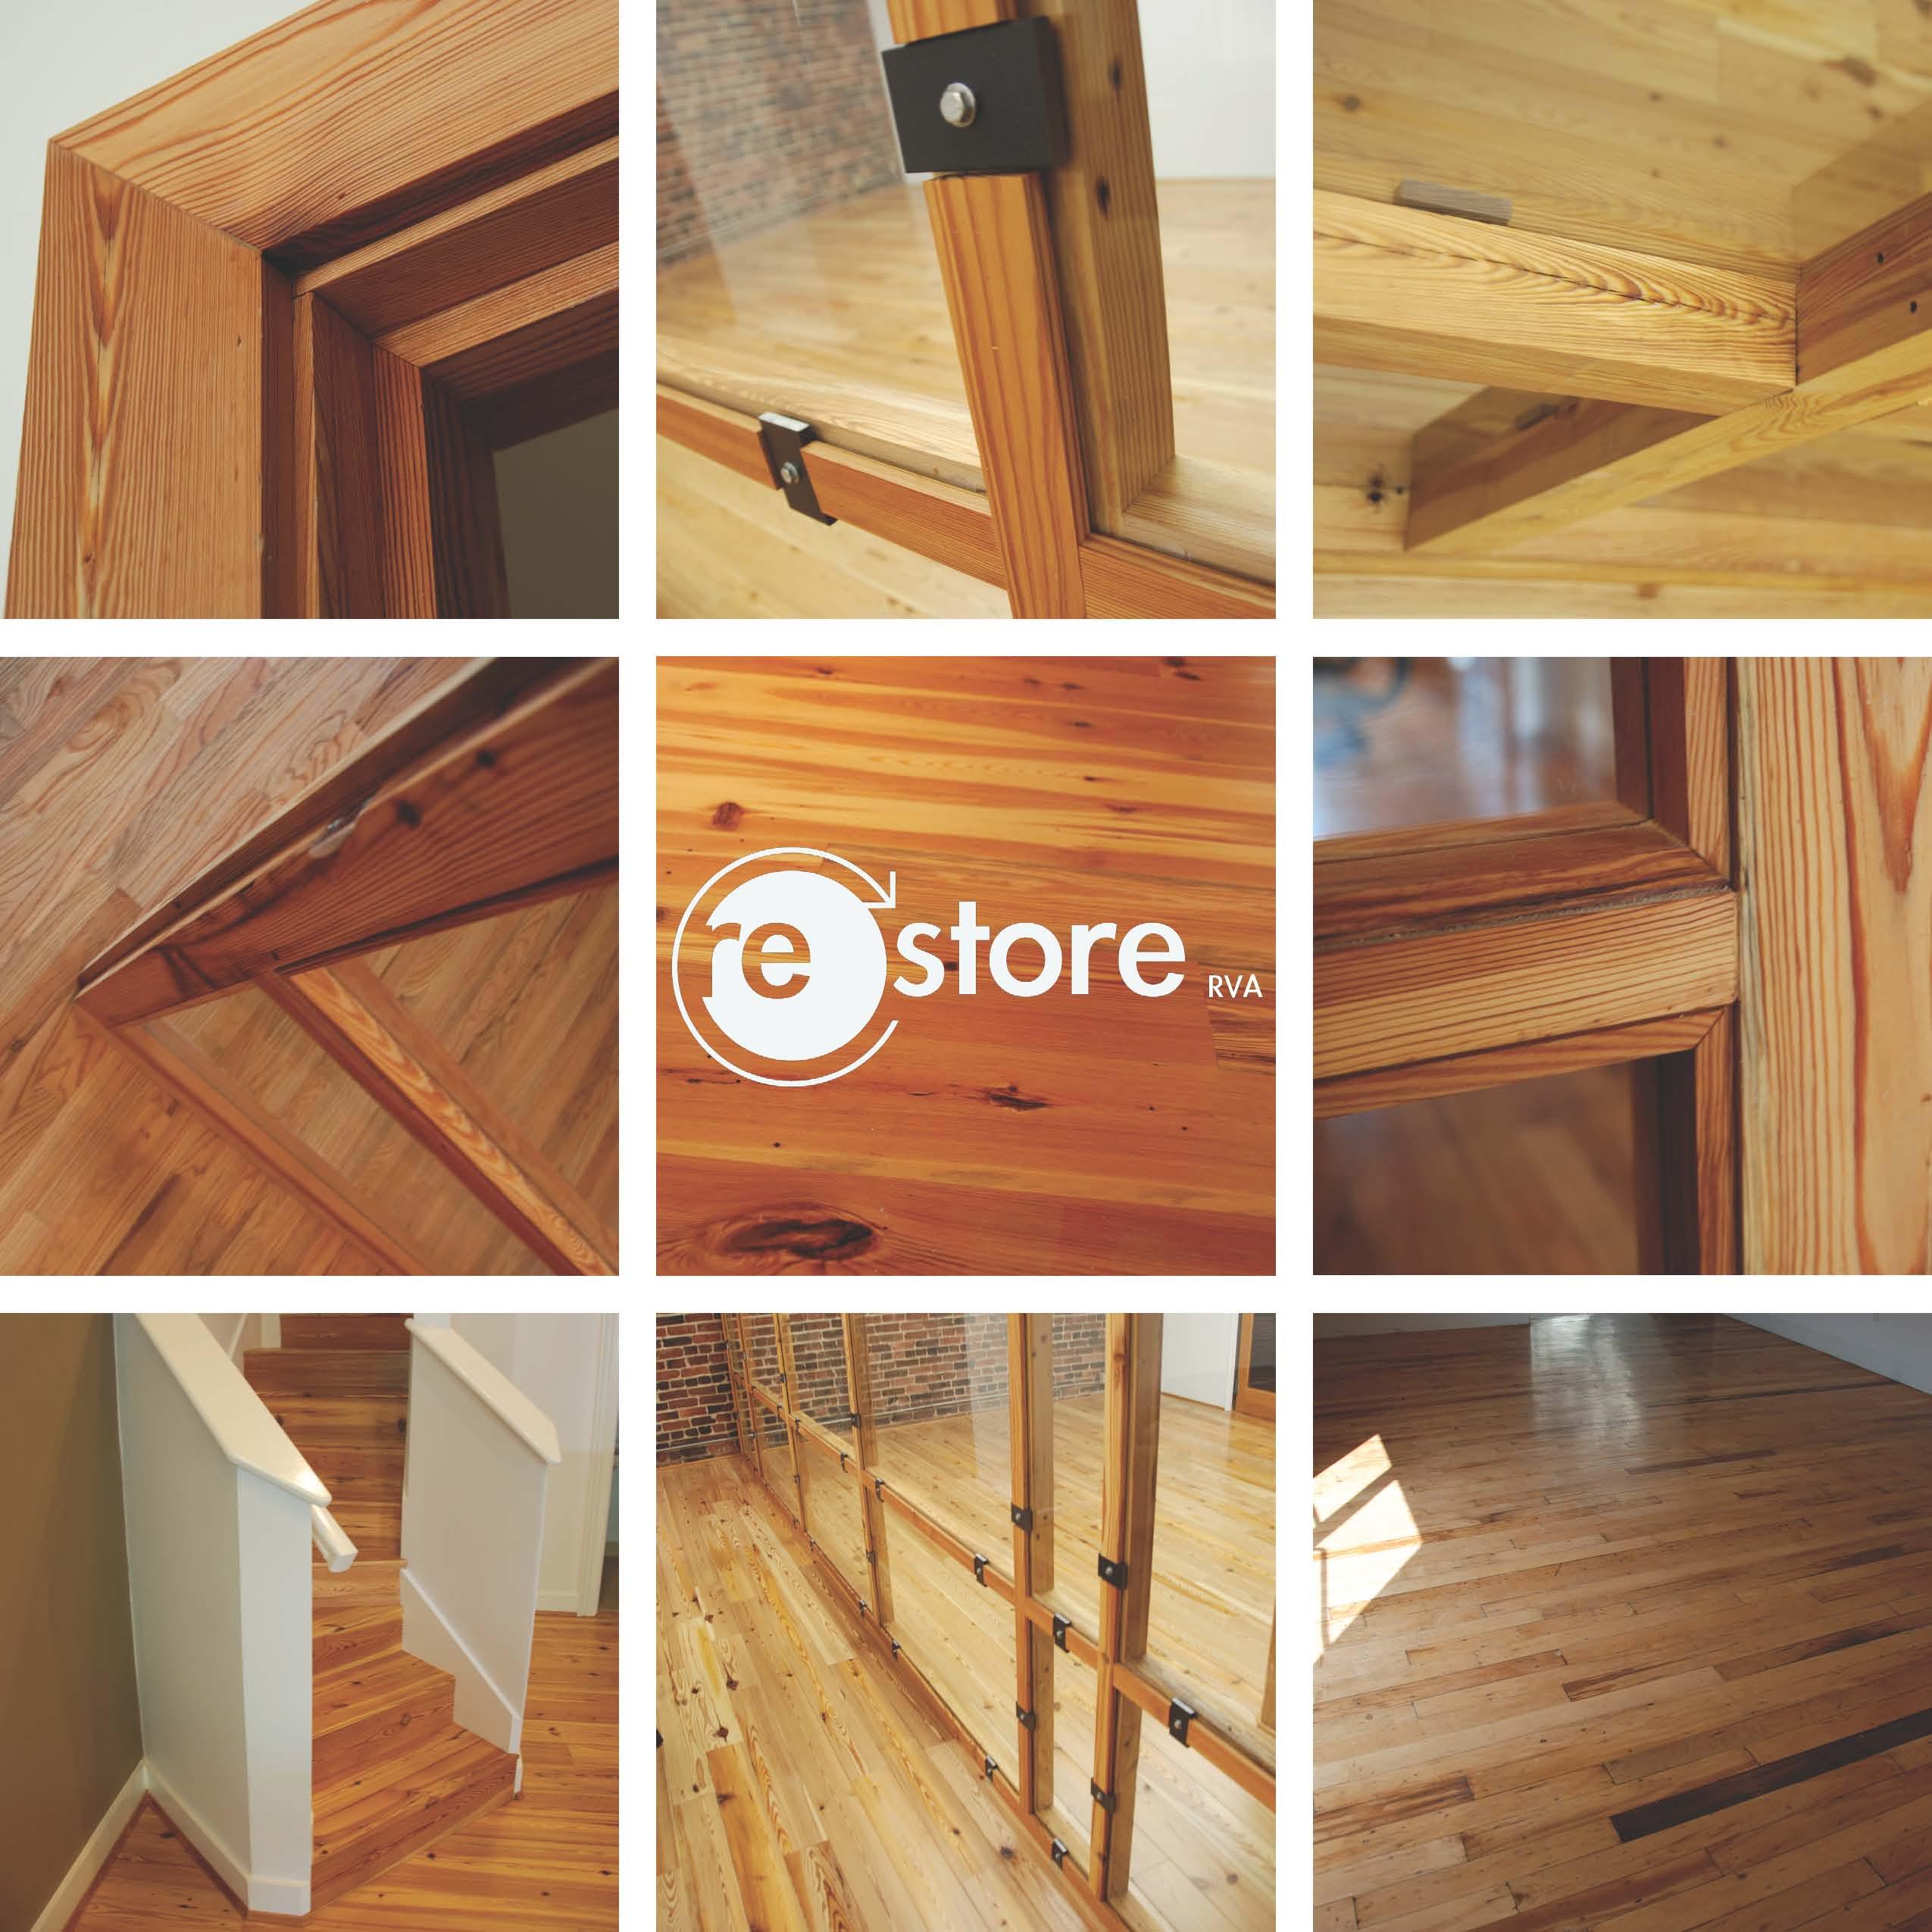 Reclaimed Wood Storefront Details